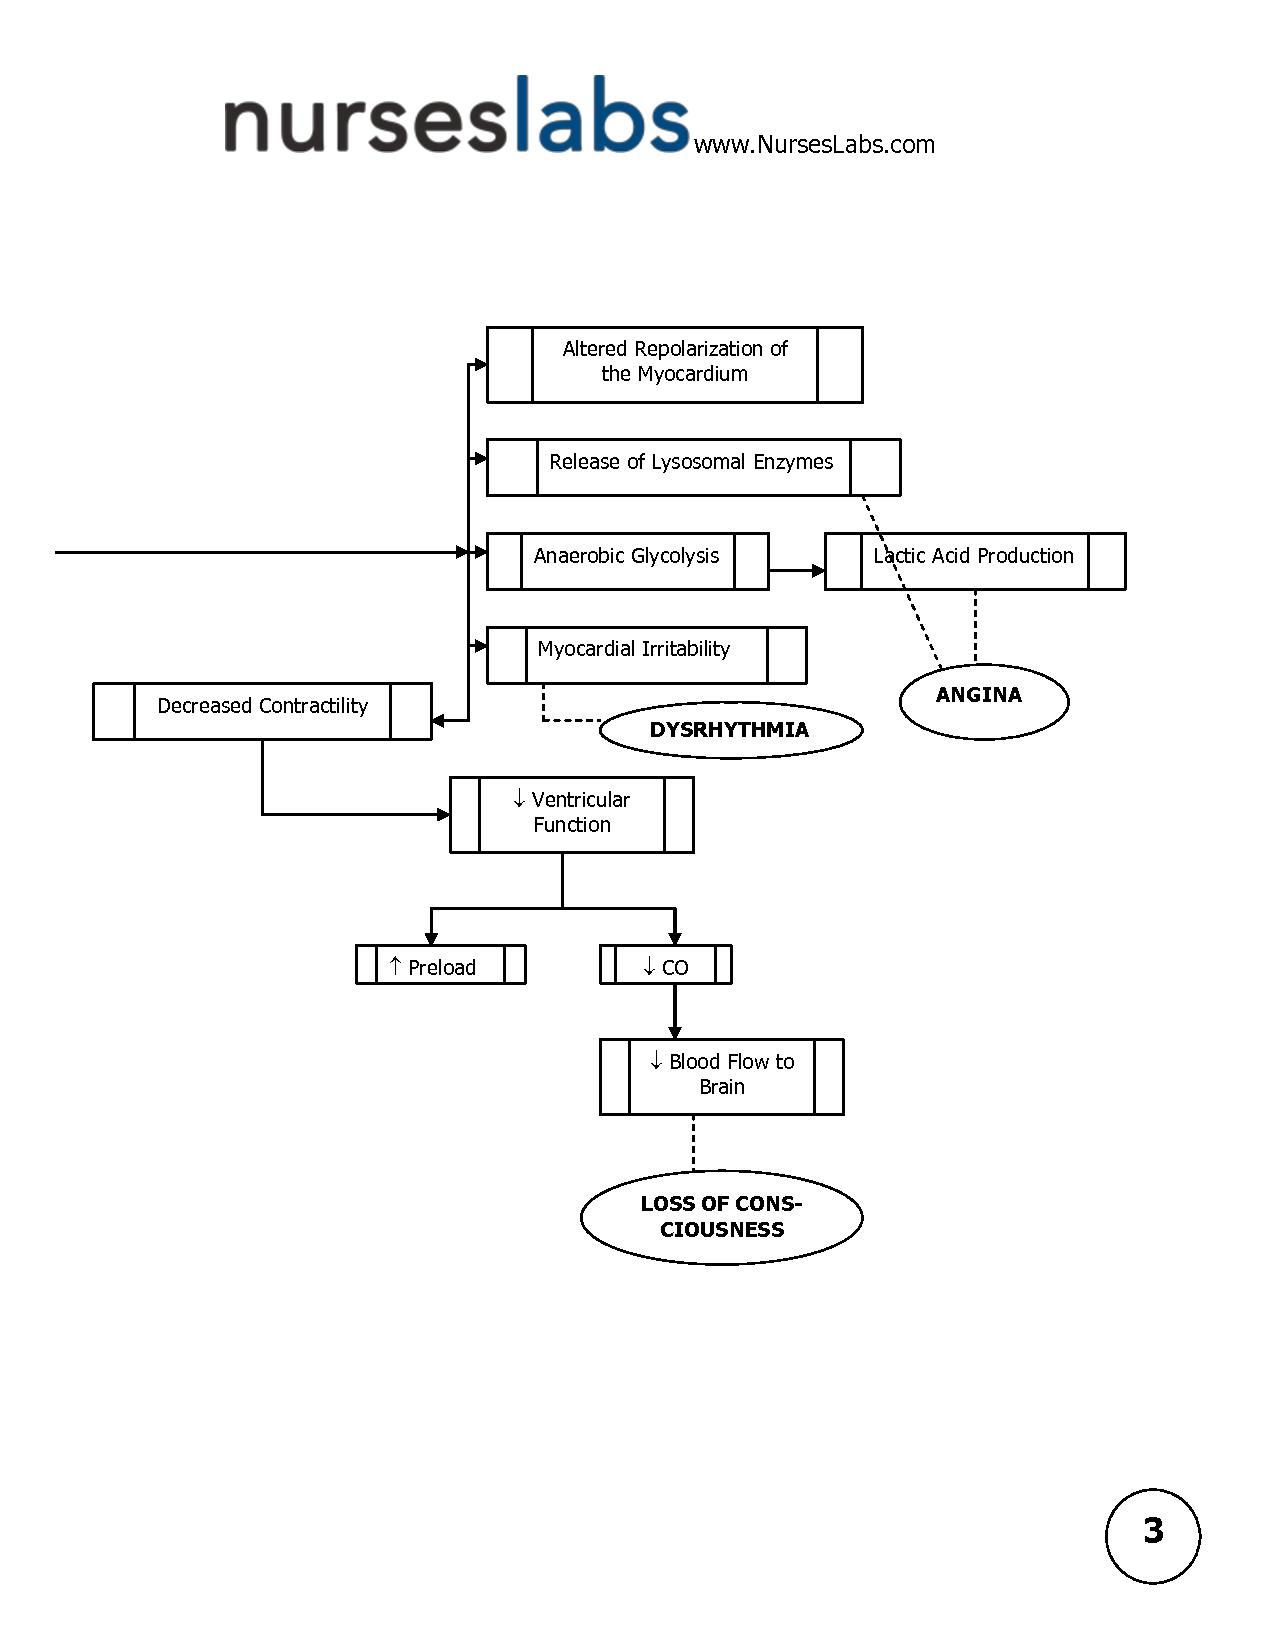 pathophysiology charts | Myocardial Infarction Pathophysiology ...